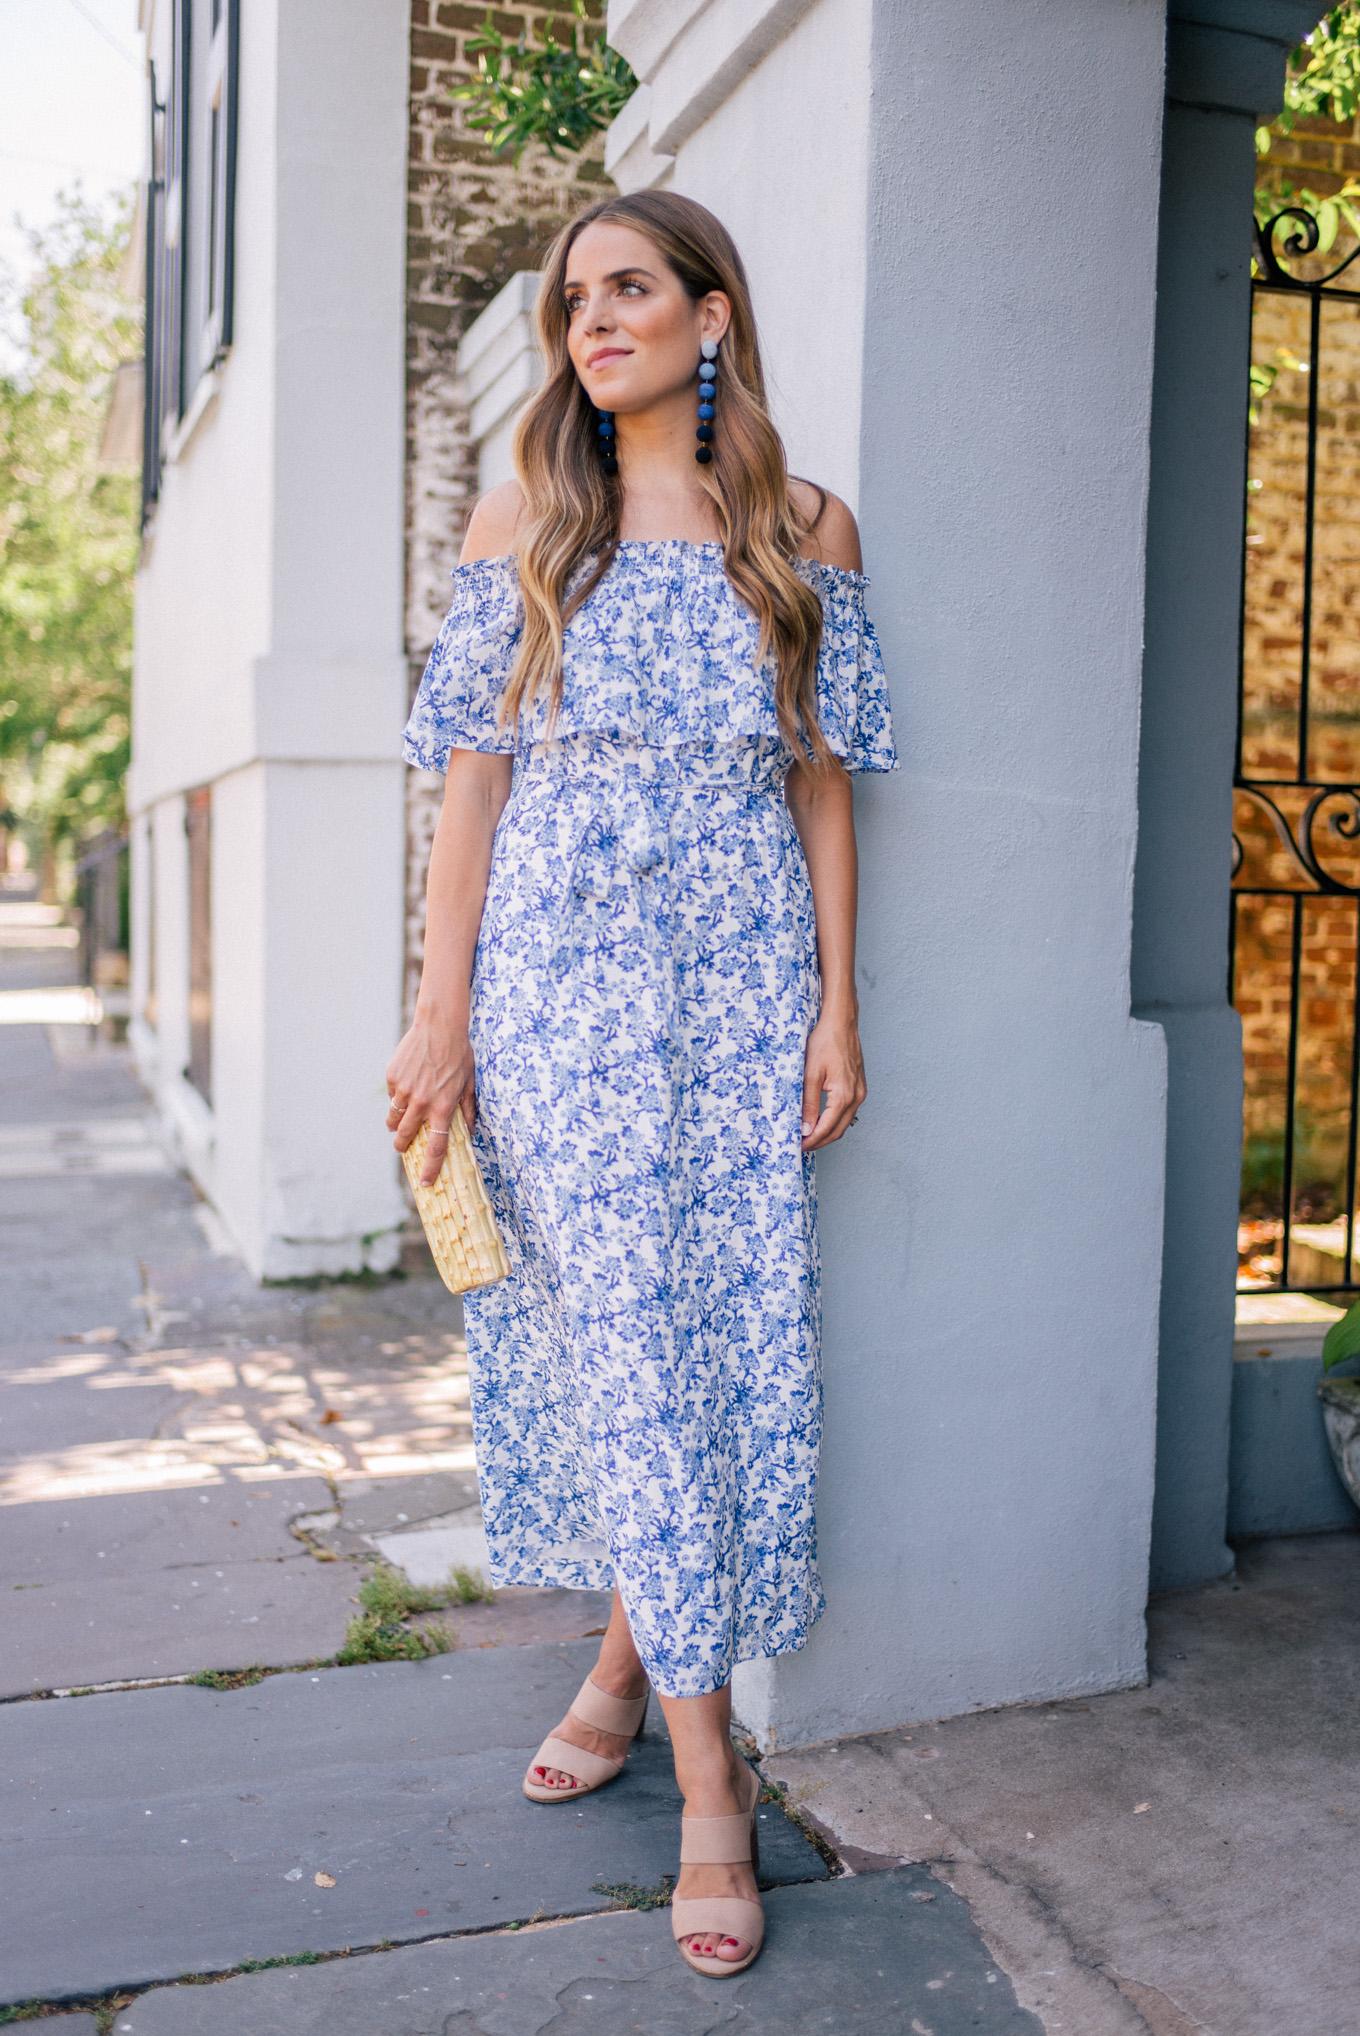 gmg-rebecca-taylor-blue-white-dress-1001670